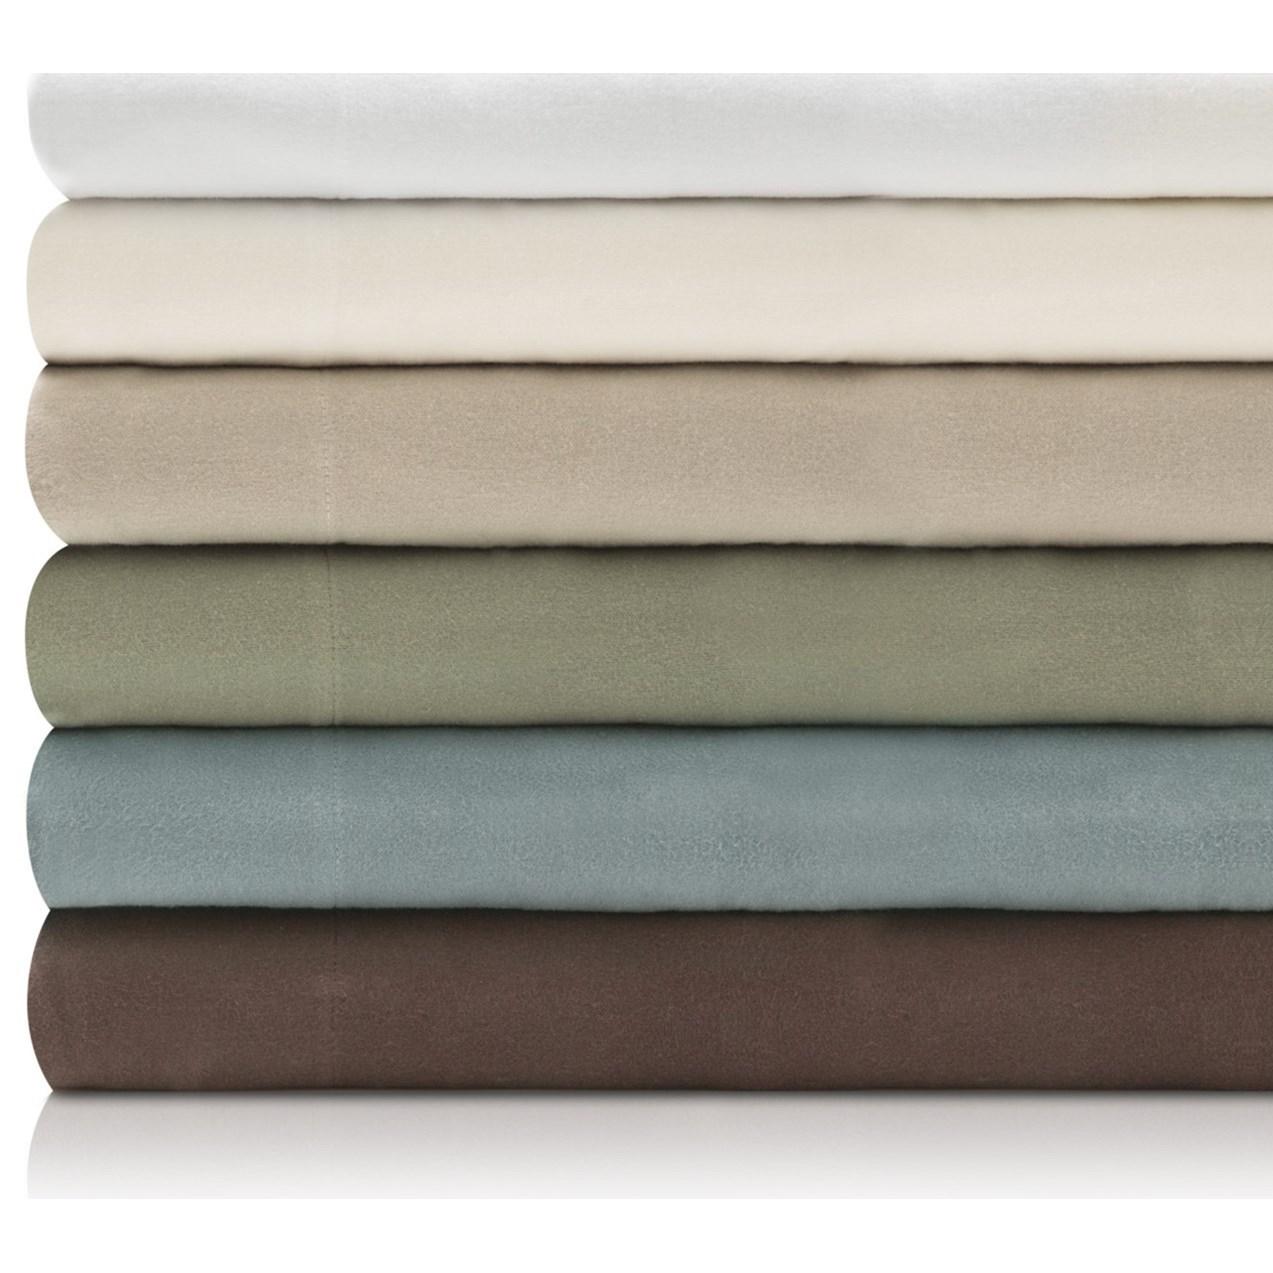 Malouf Portuguese Flannel King Woven™ Portuguese Flannel Sheet Set - Item Number: WO19KKOAFS